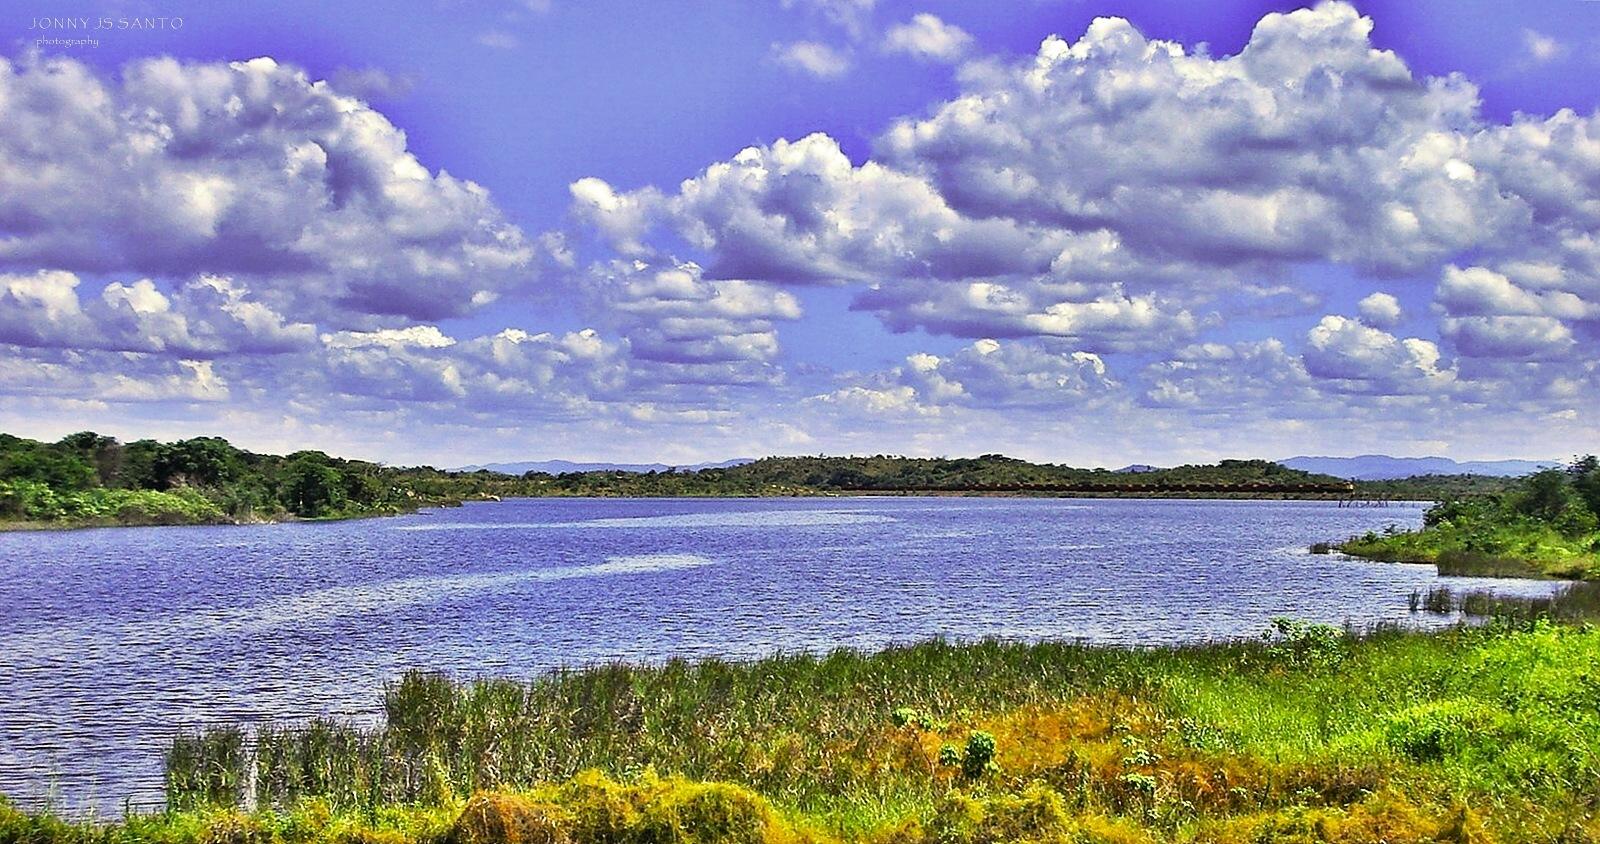 The Lagoon by Jonny Santo